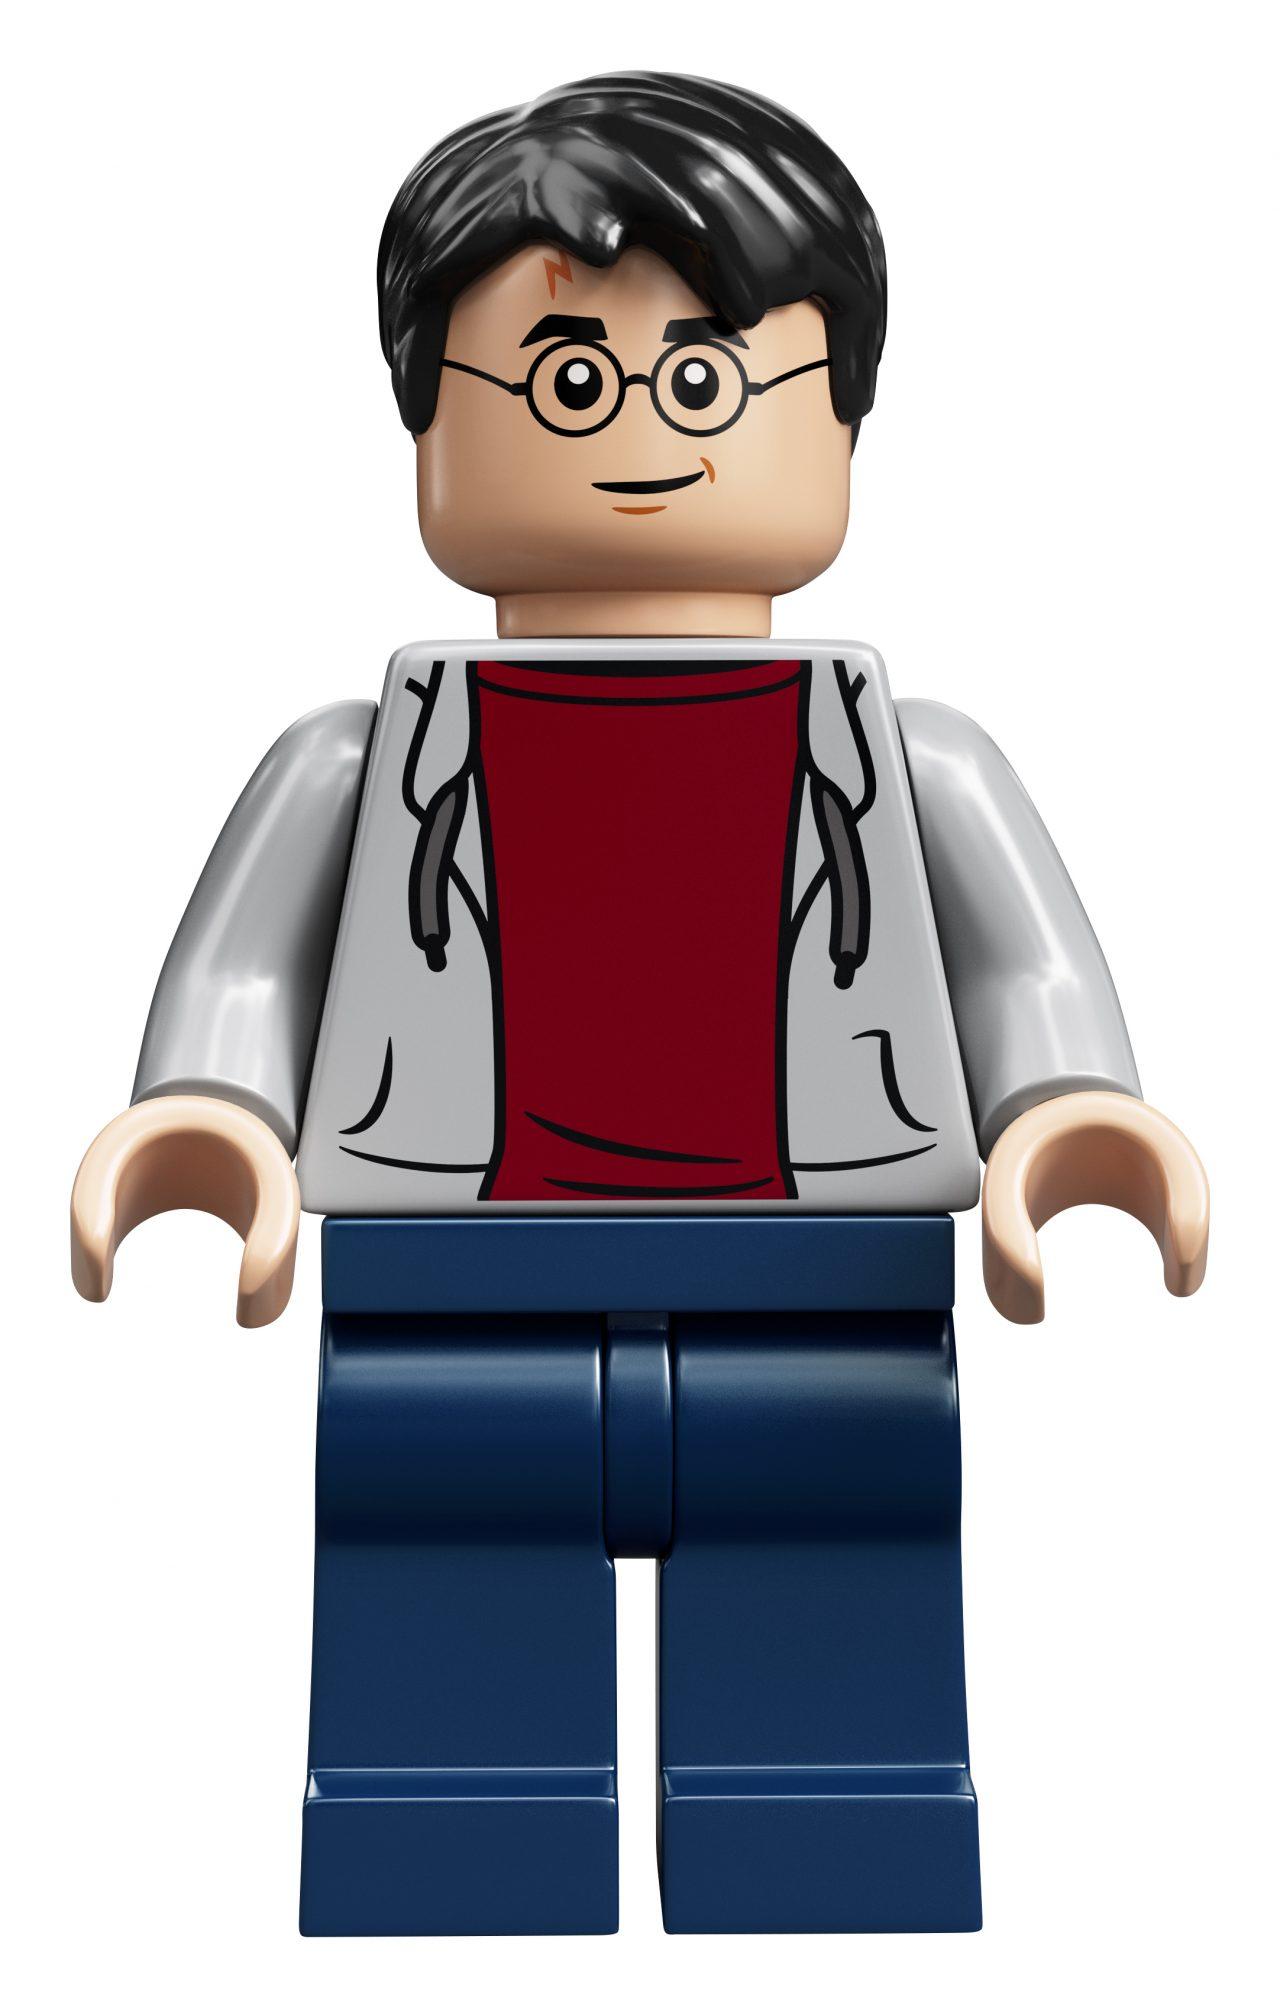 Harry Potter Minifigure Brickipedia Fandom